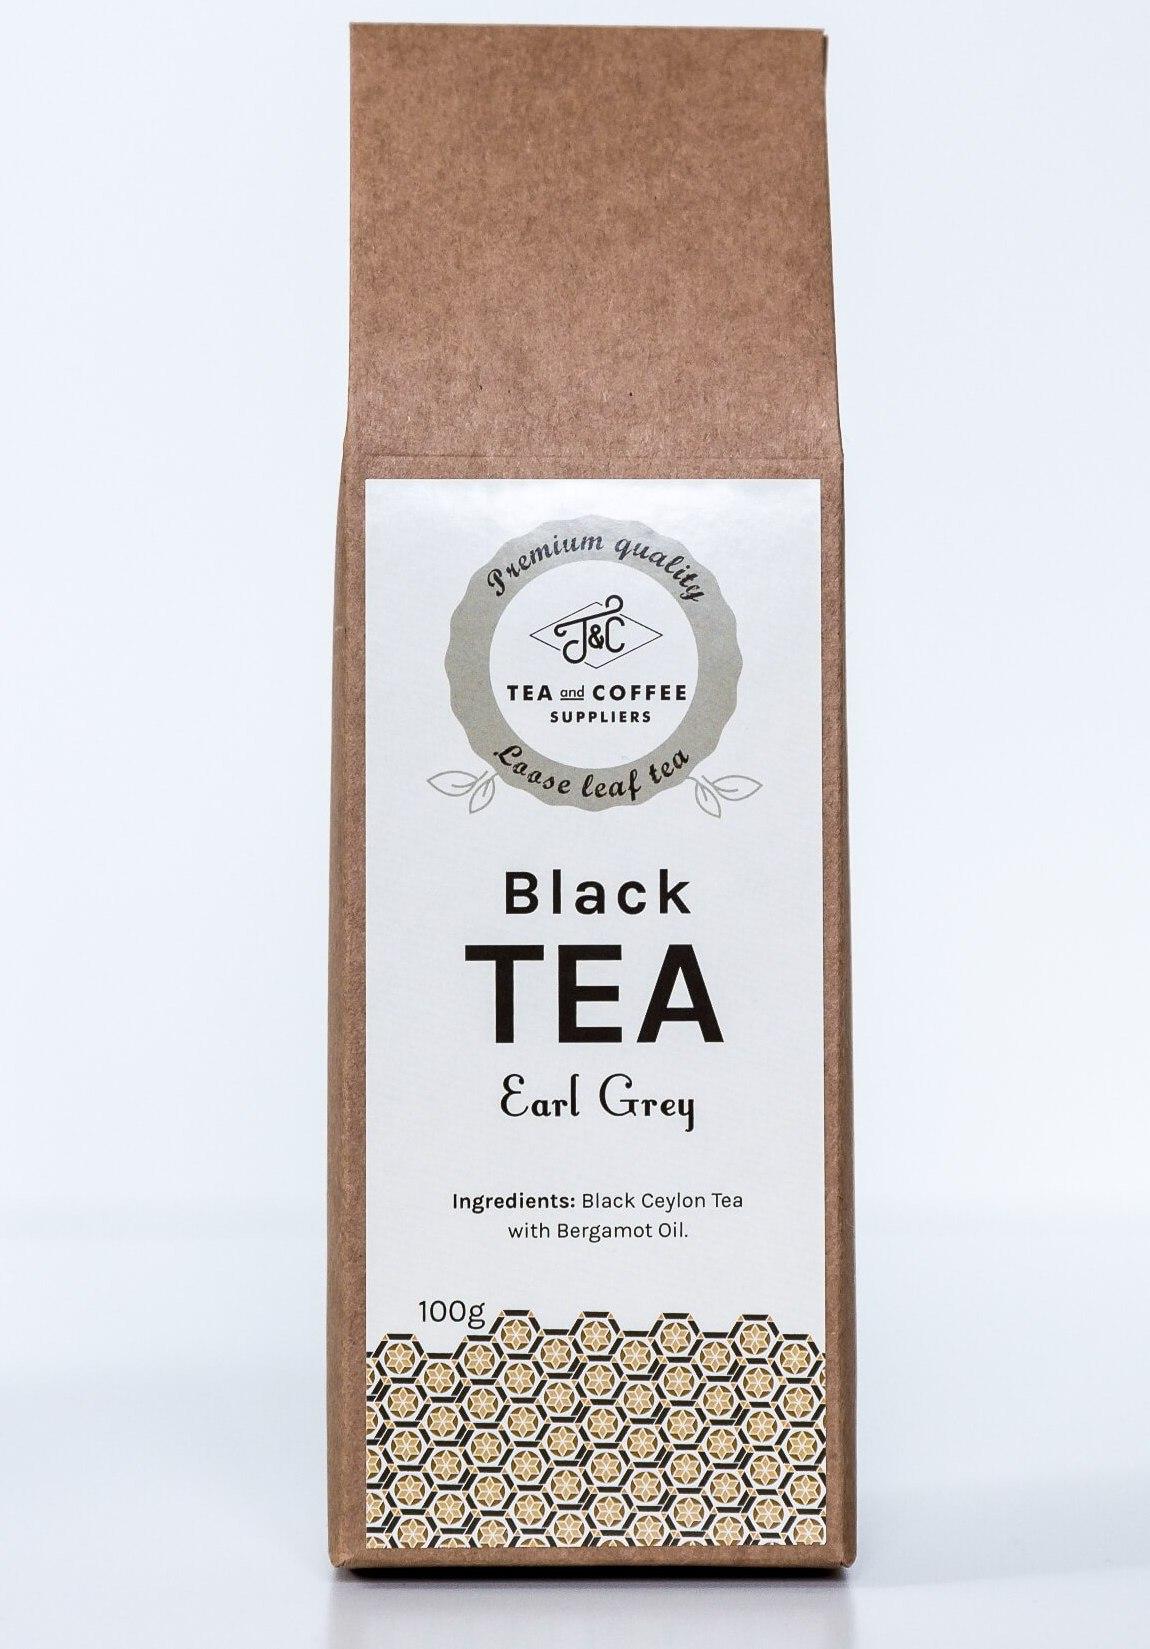 T&C Flavoured Black Tea 'Earl Grey'